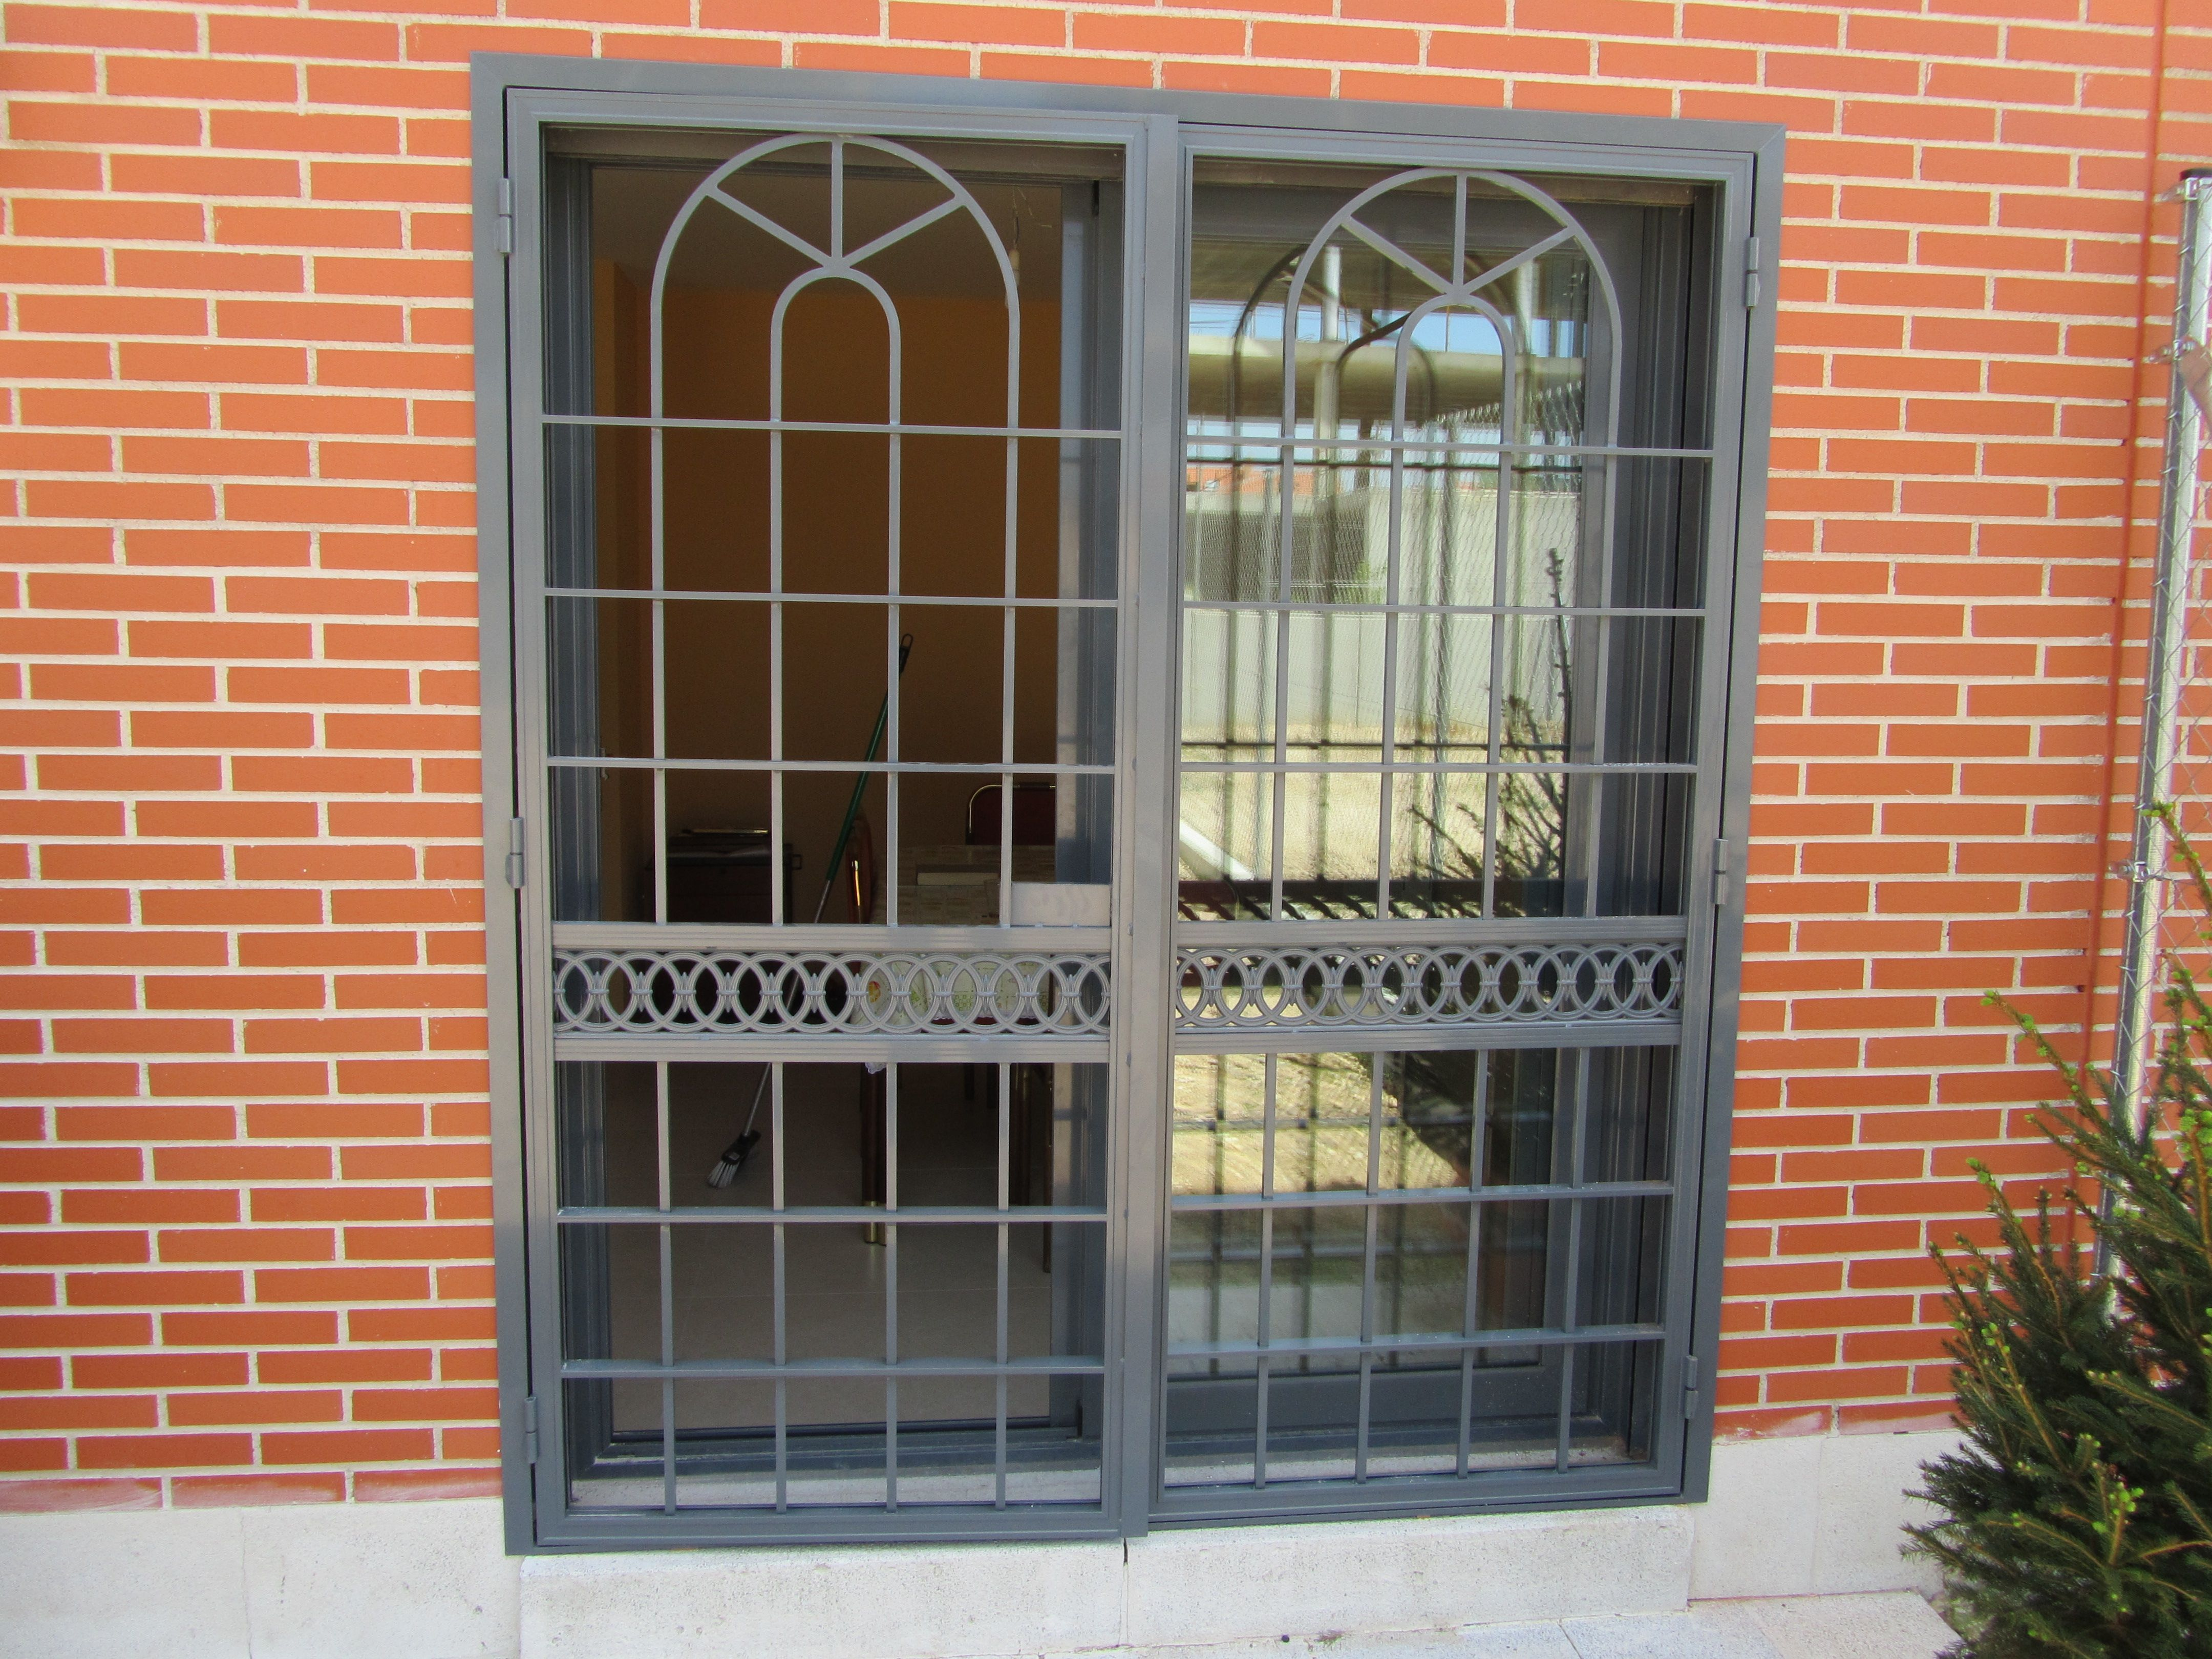 Reja puerta abatible aluminio puertas pinterest for Puertas de metal para exterior